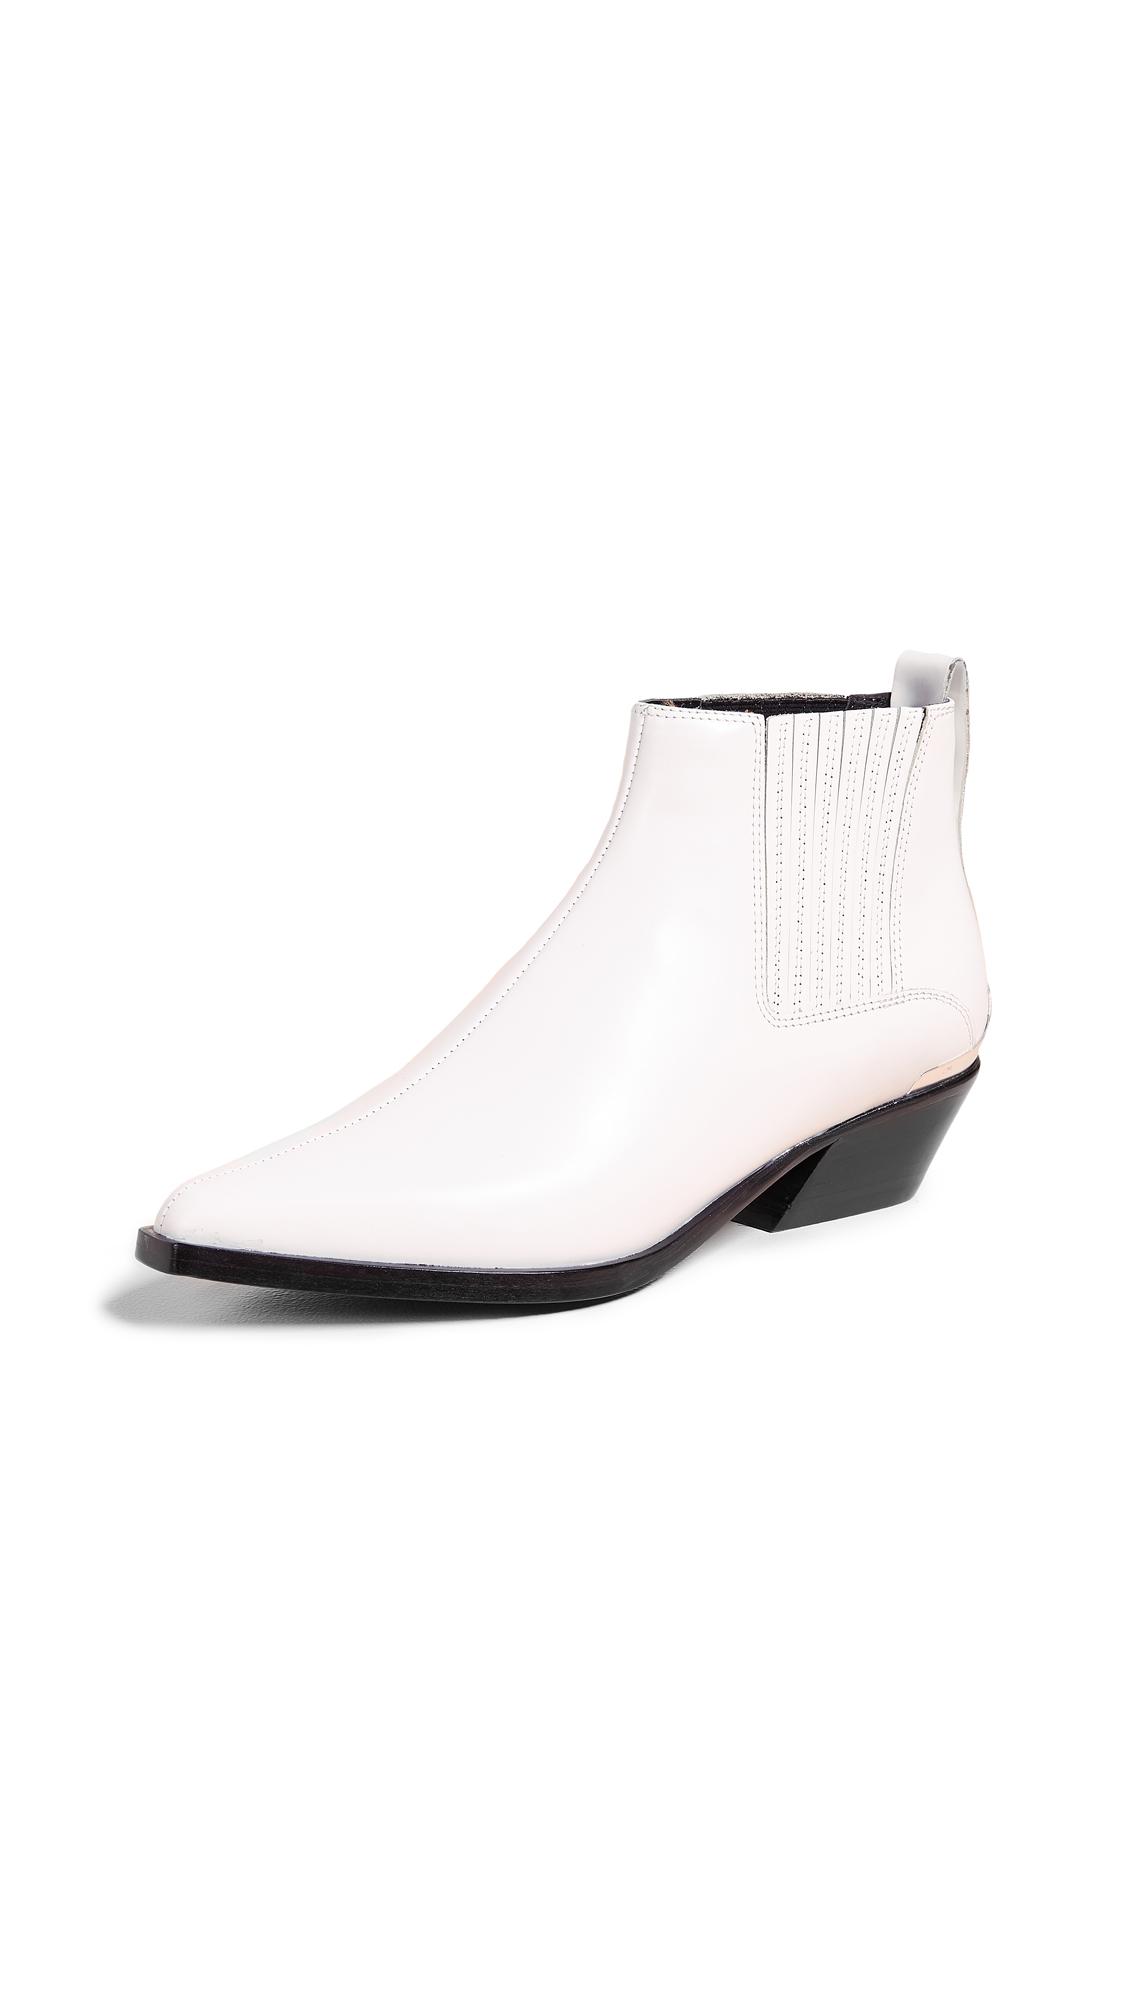 Rag & Bone Westin Boots - Antique White